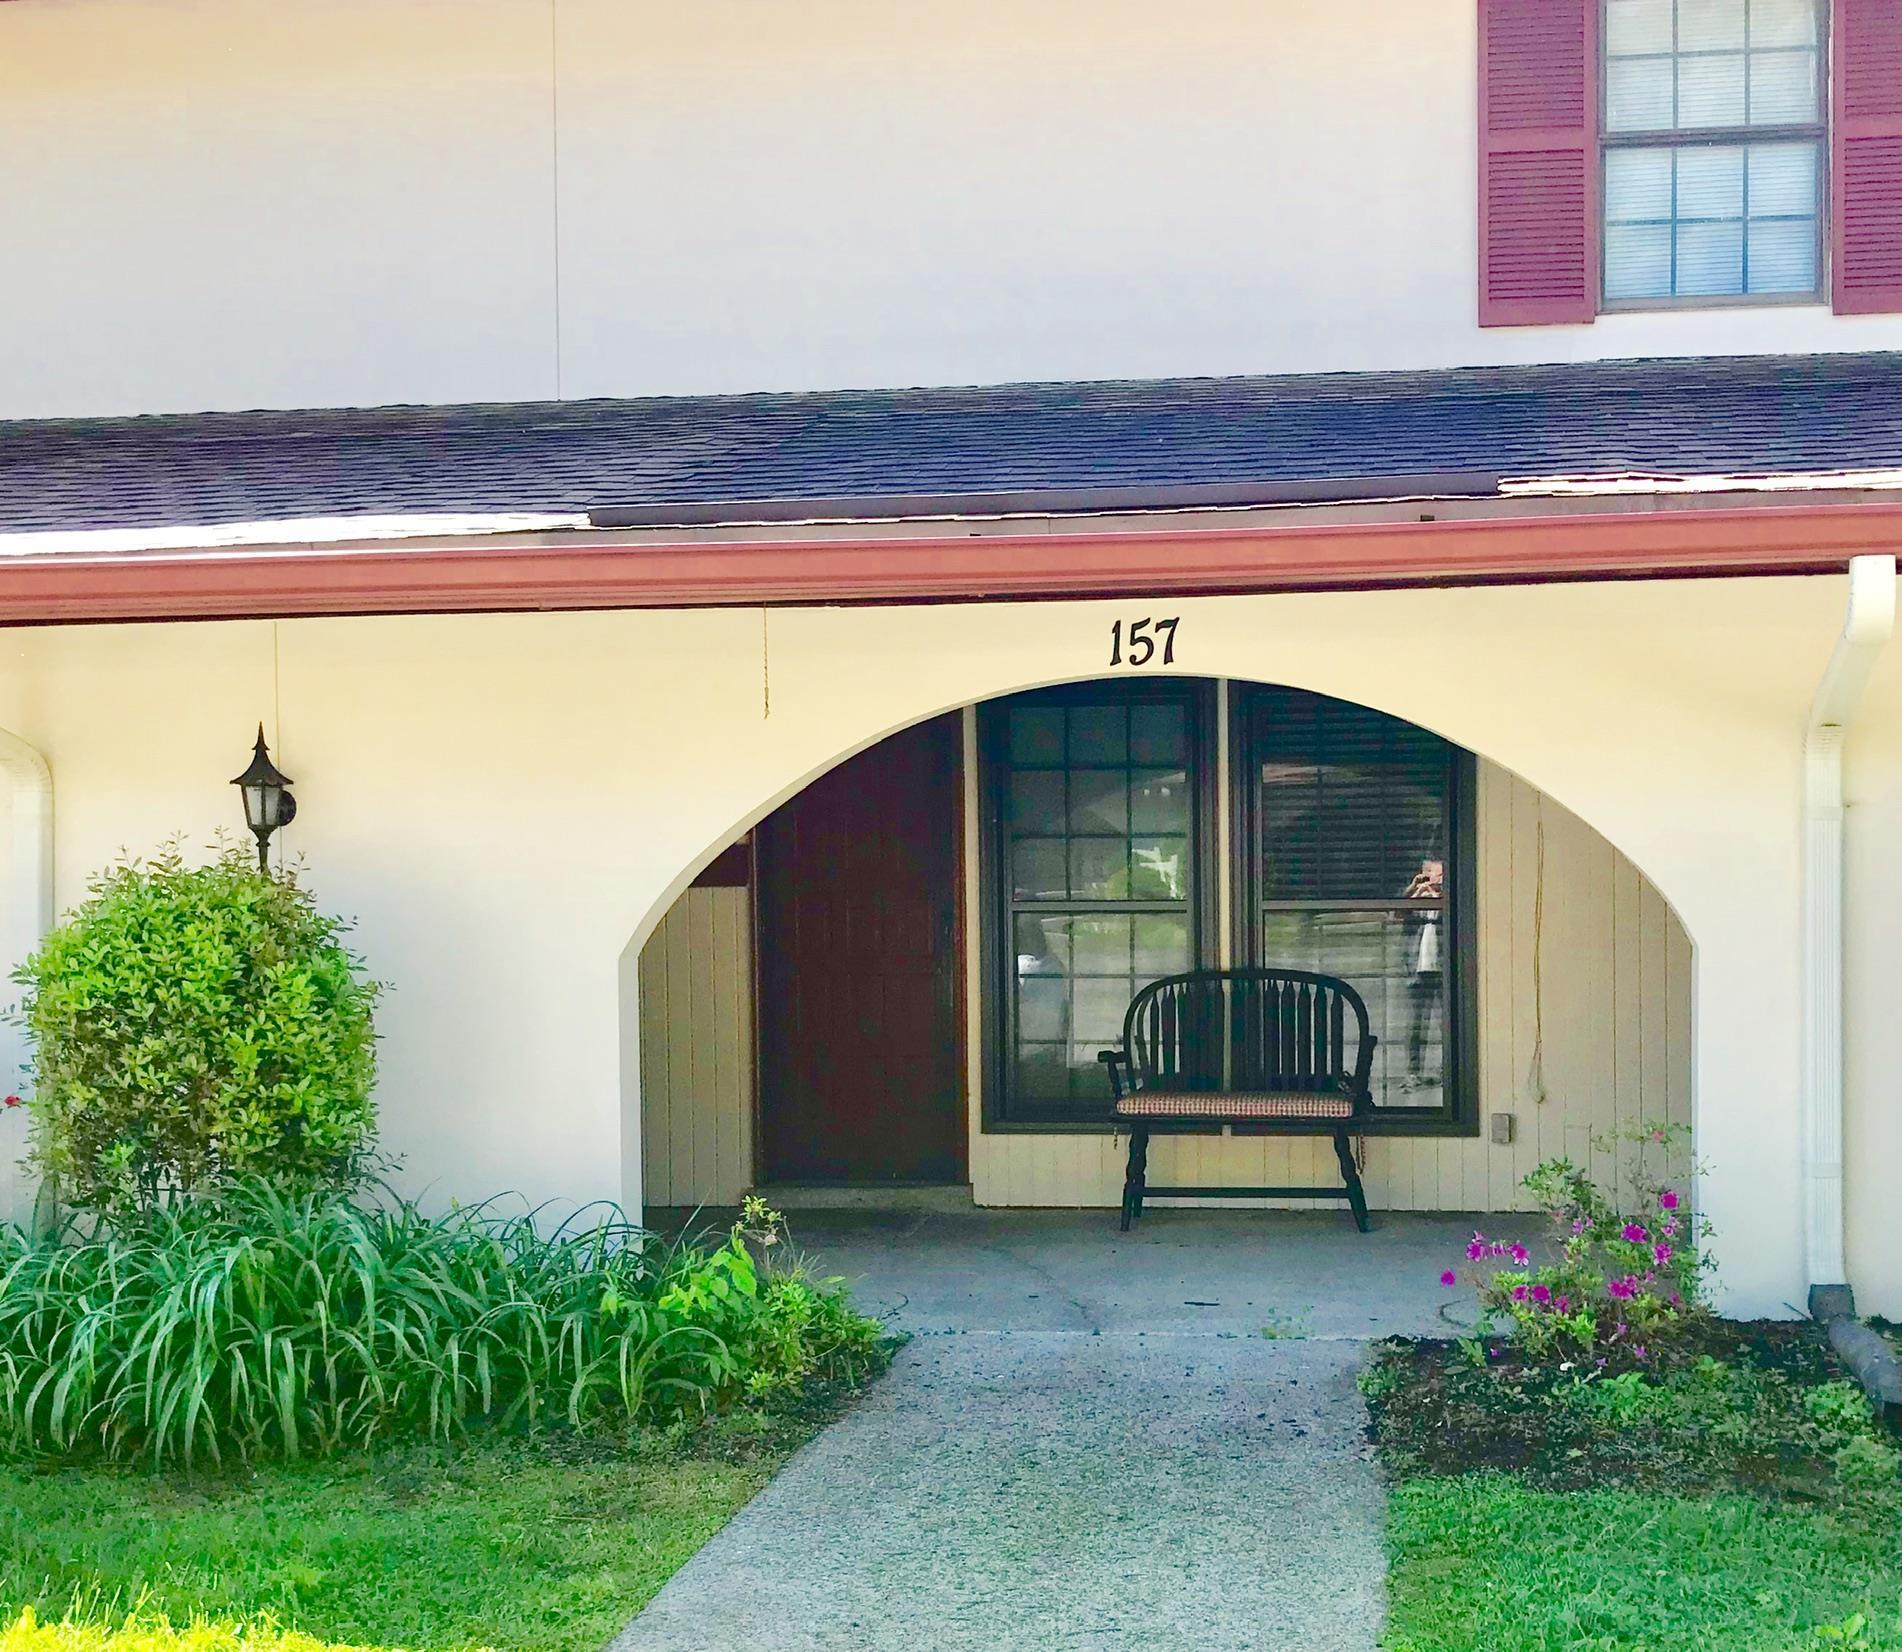 214 Old Hickory Blvd Apt 157, Nashville, TN 37221 - Nashville, TN real estate listing